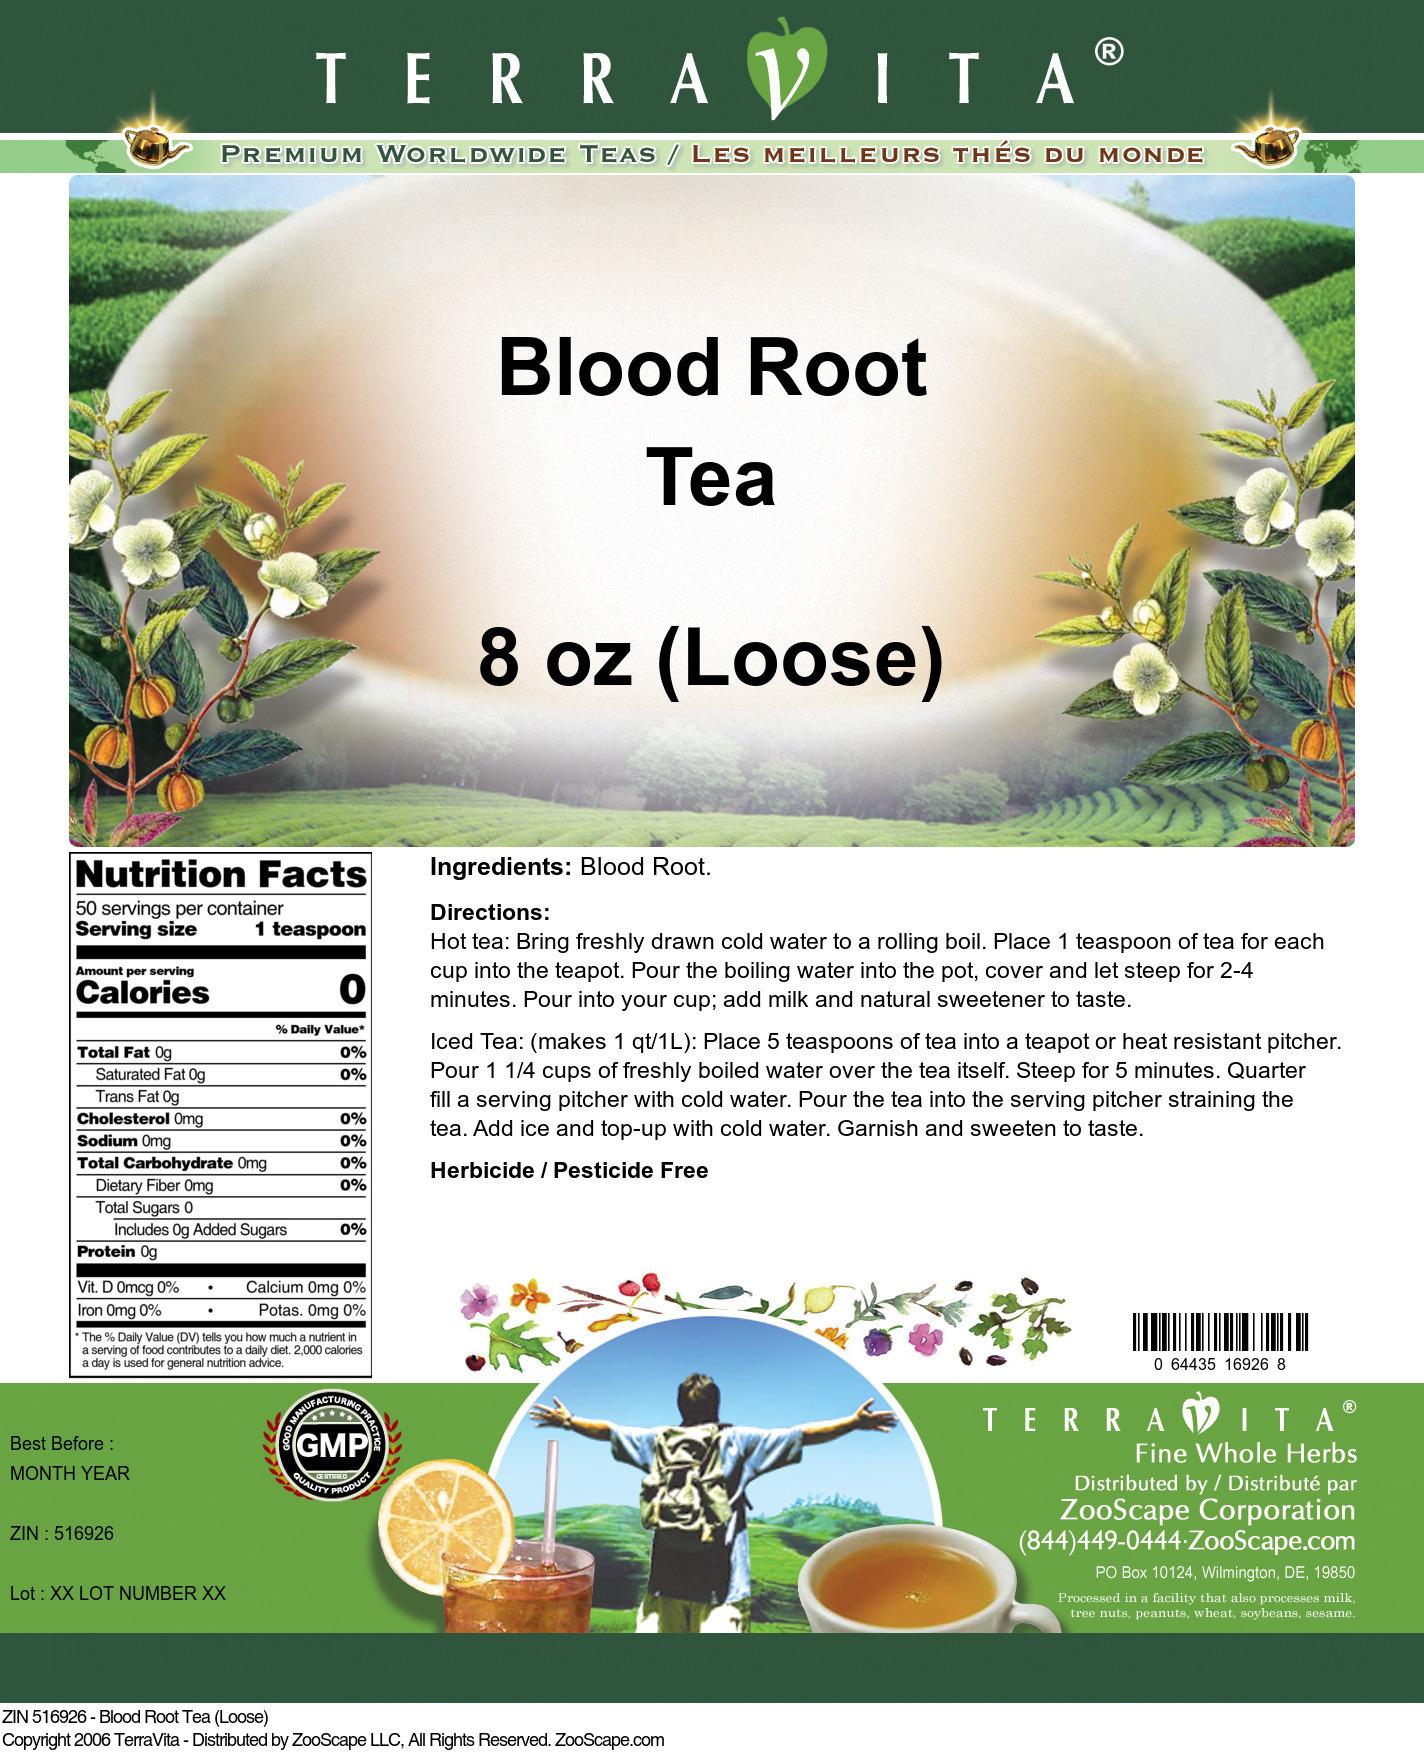 Blood Root Tea (Loose)